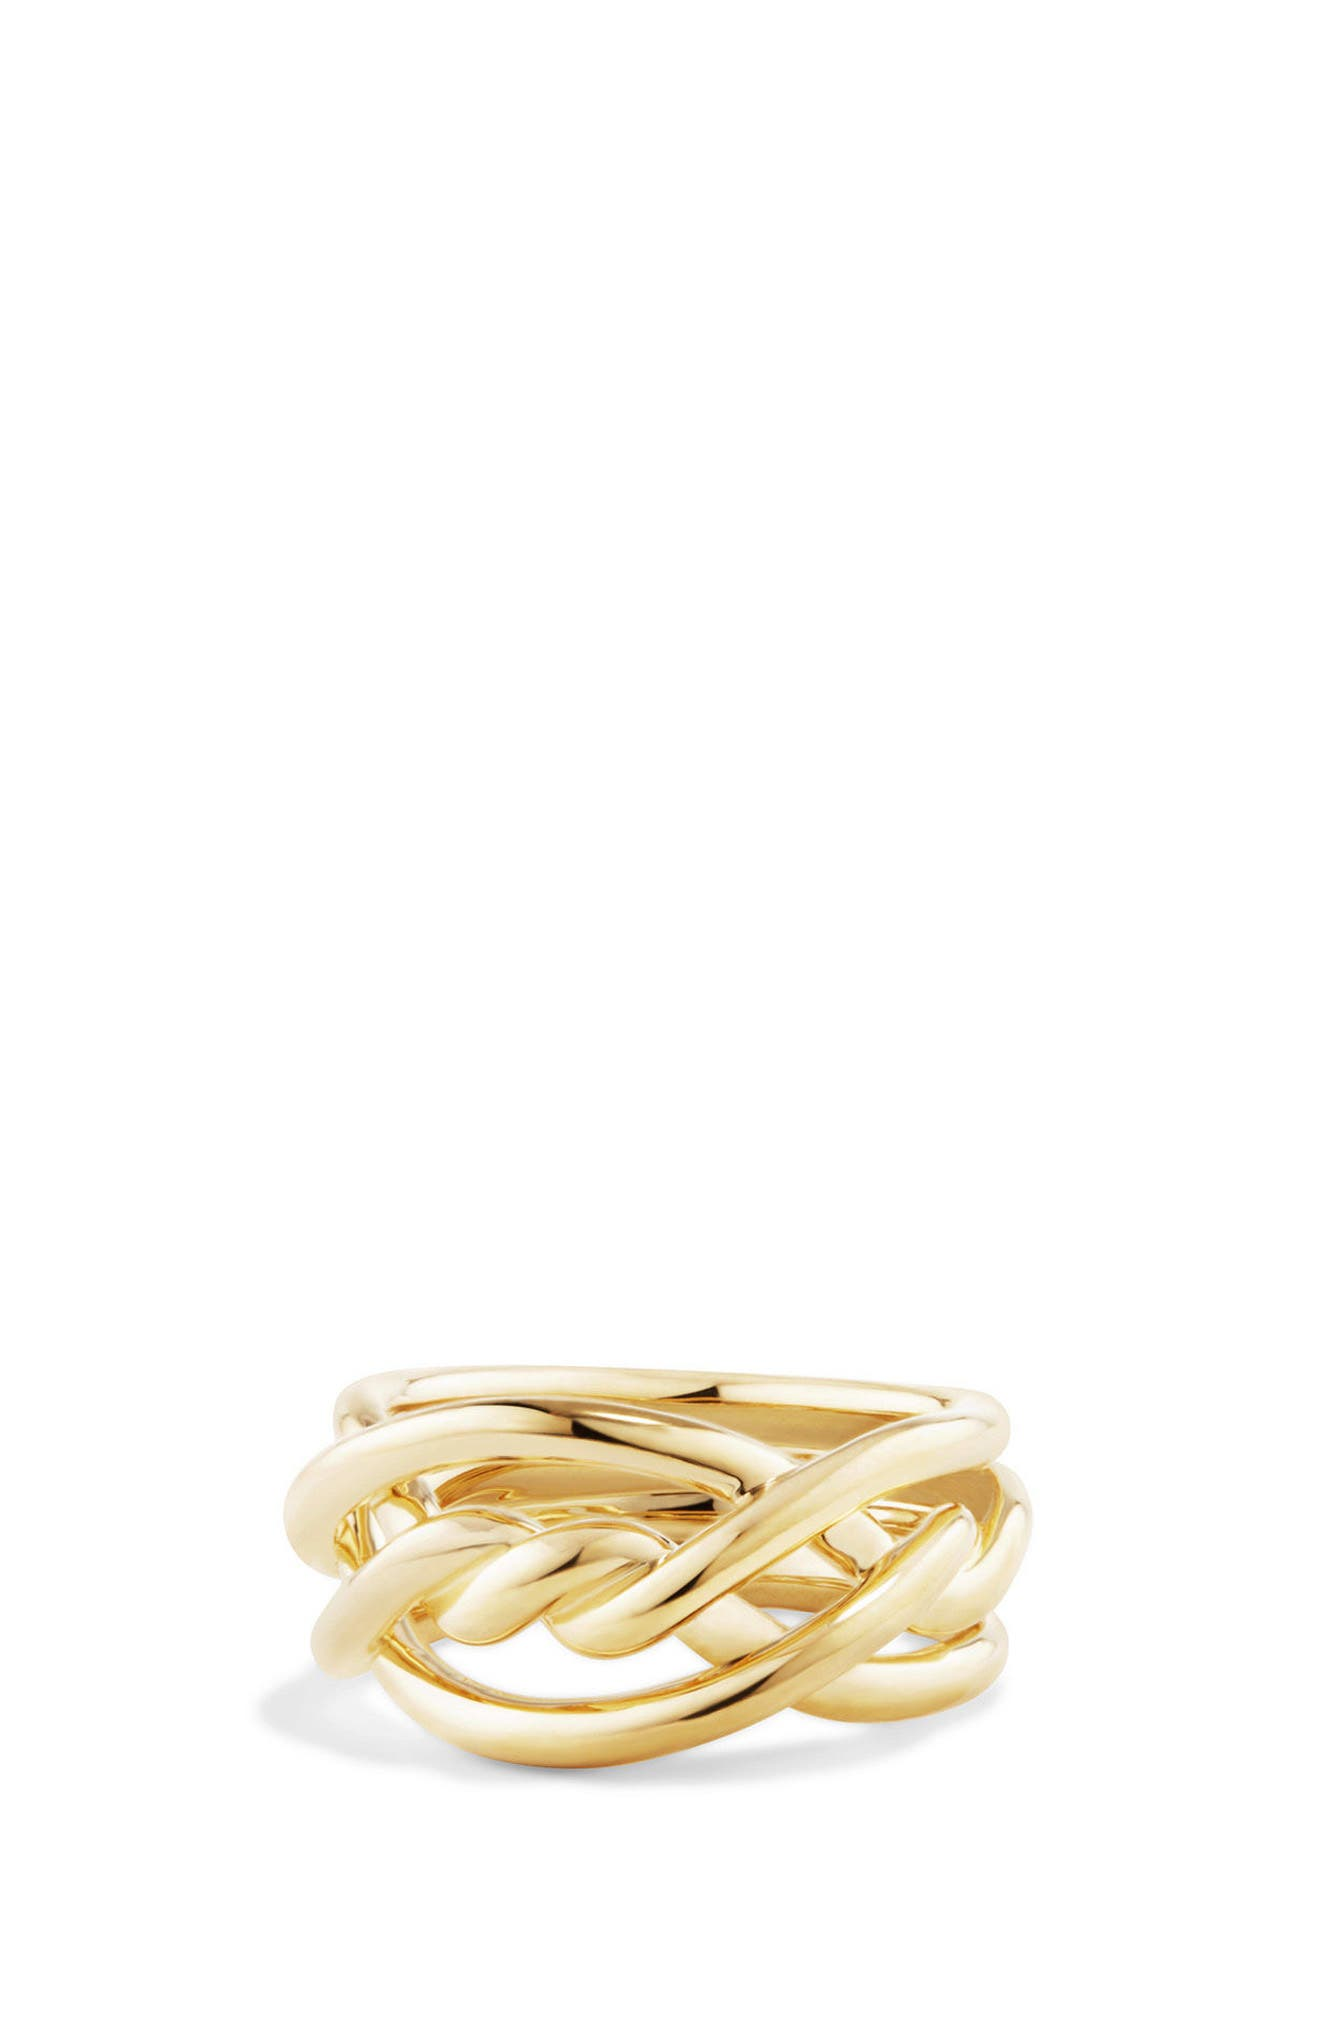 Alternate Image 1 Selected - David Yurman Continuance Ring in 18K Gold